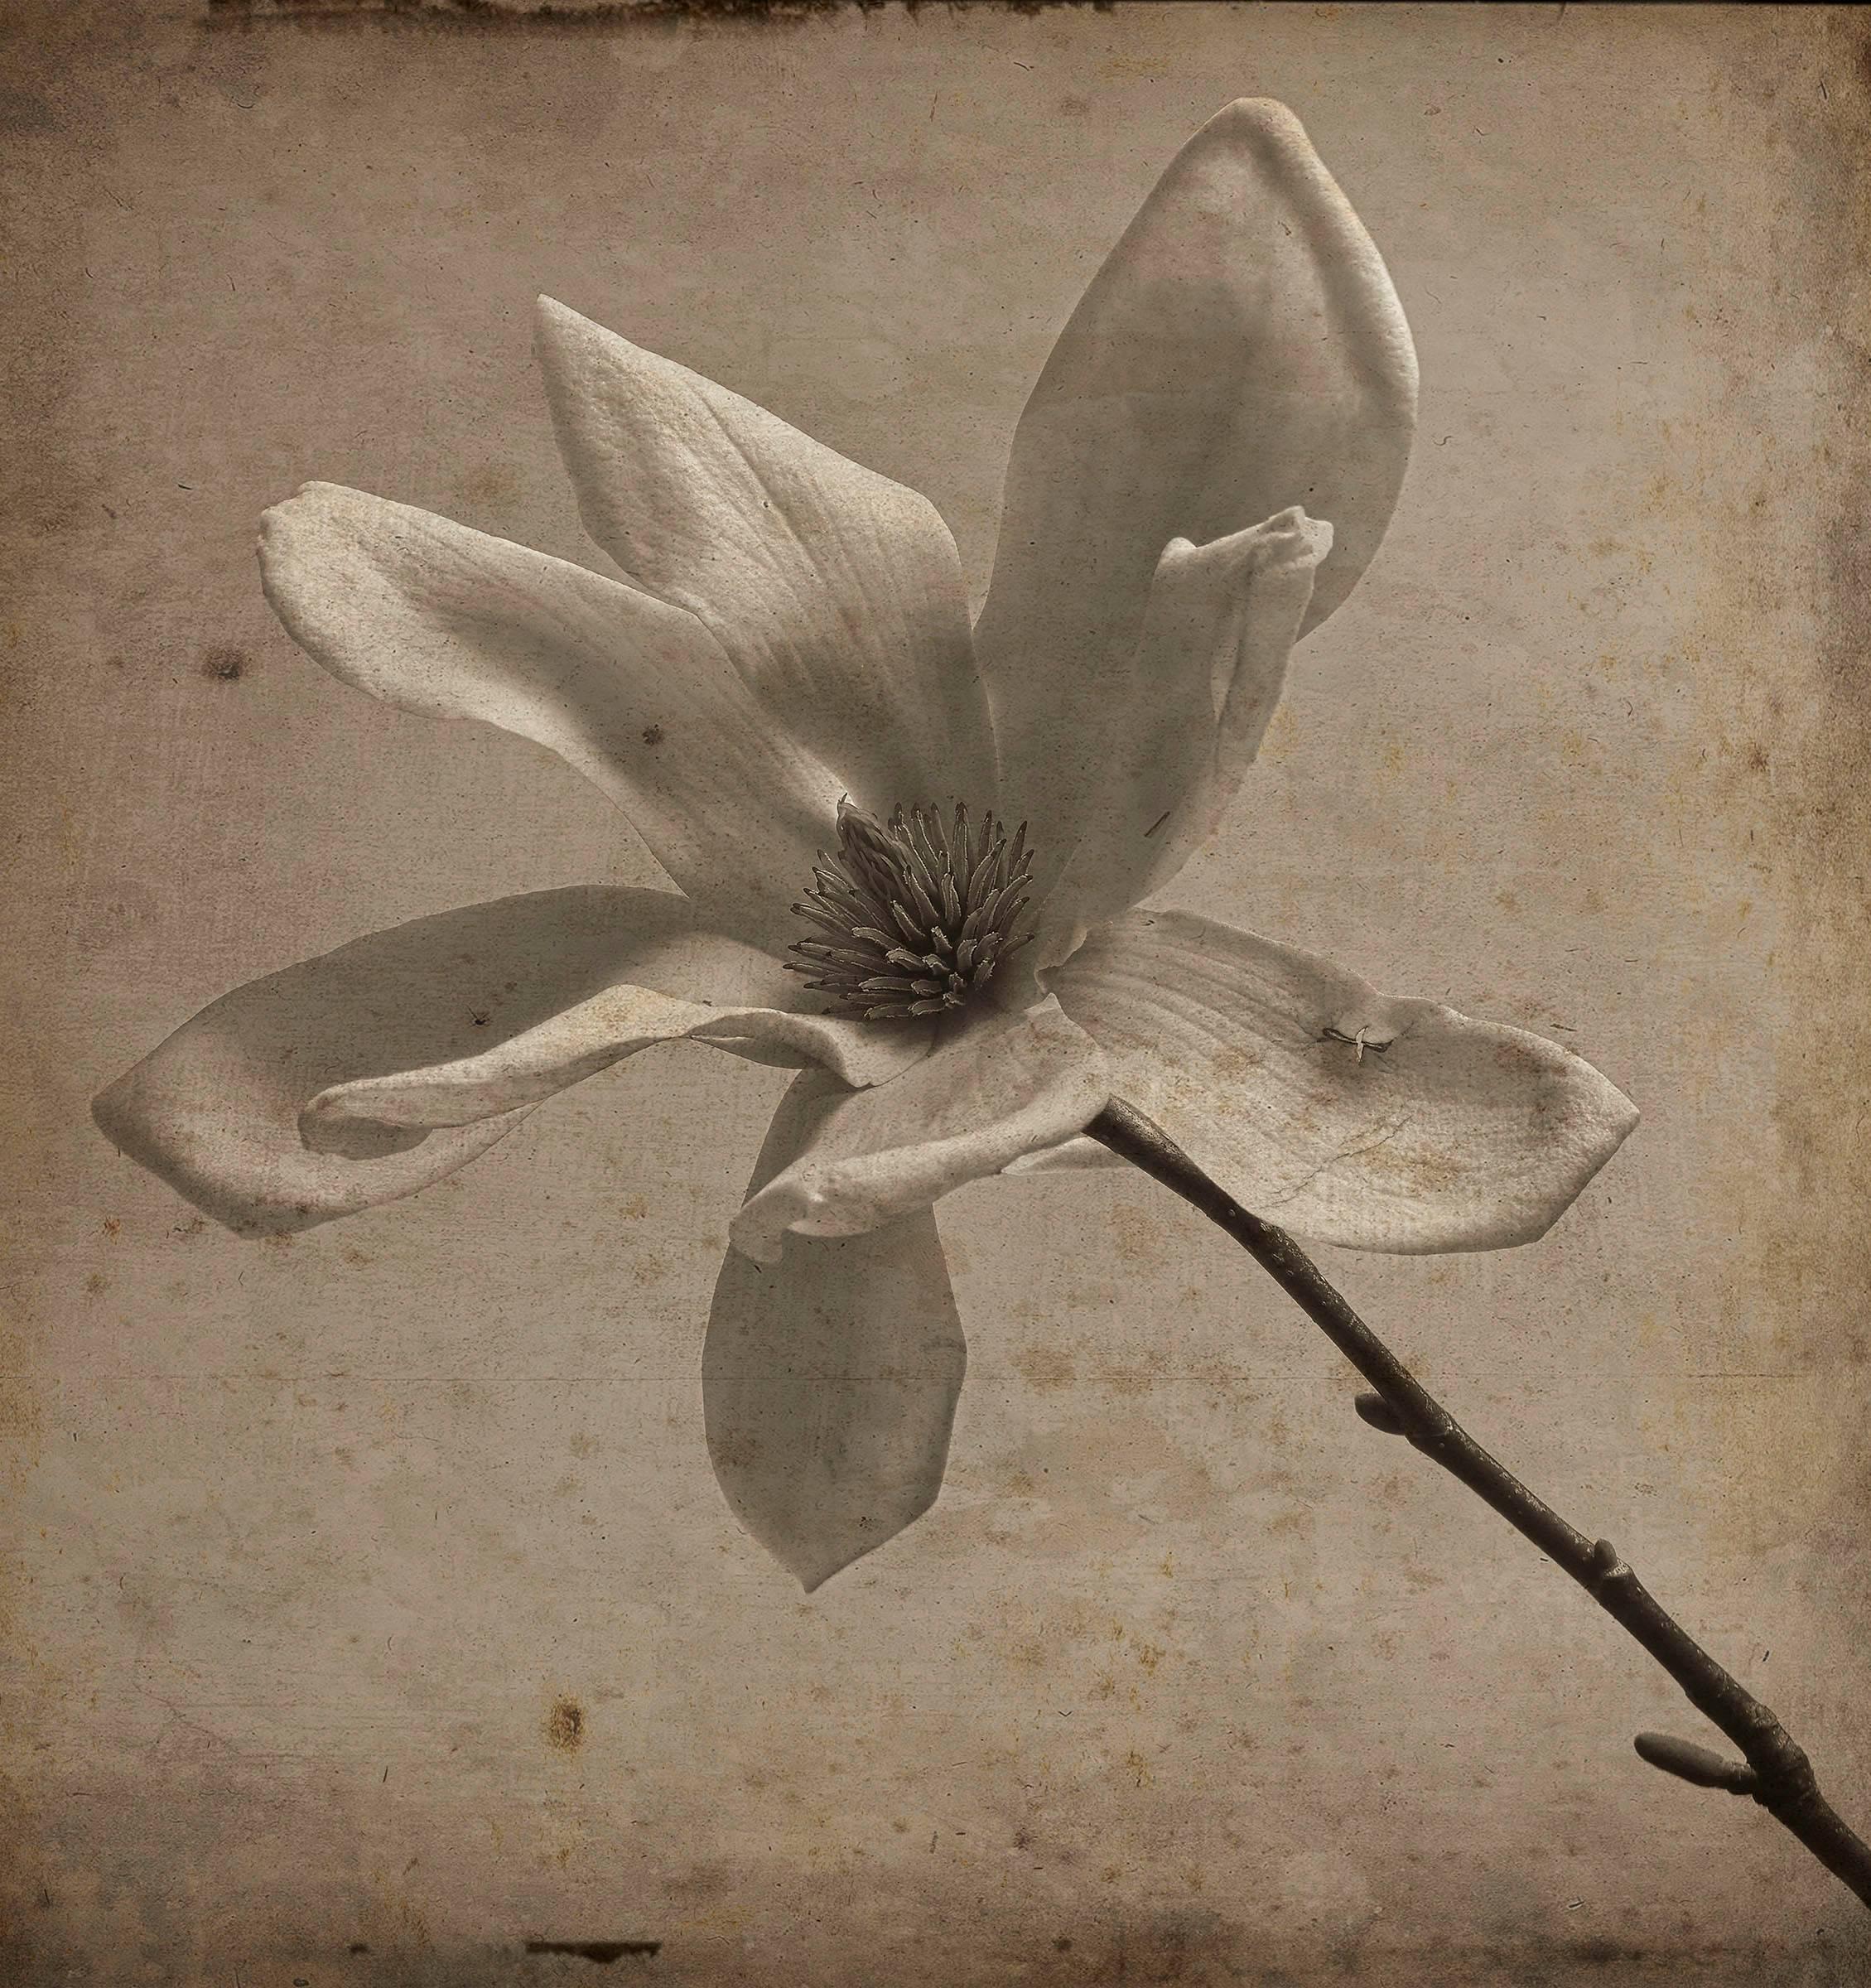 Gray Magnolia (Elegant Sepia Toned Photograph with Mixed Media of Single Flower)